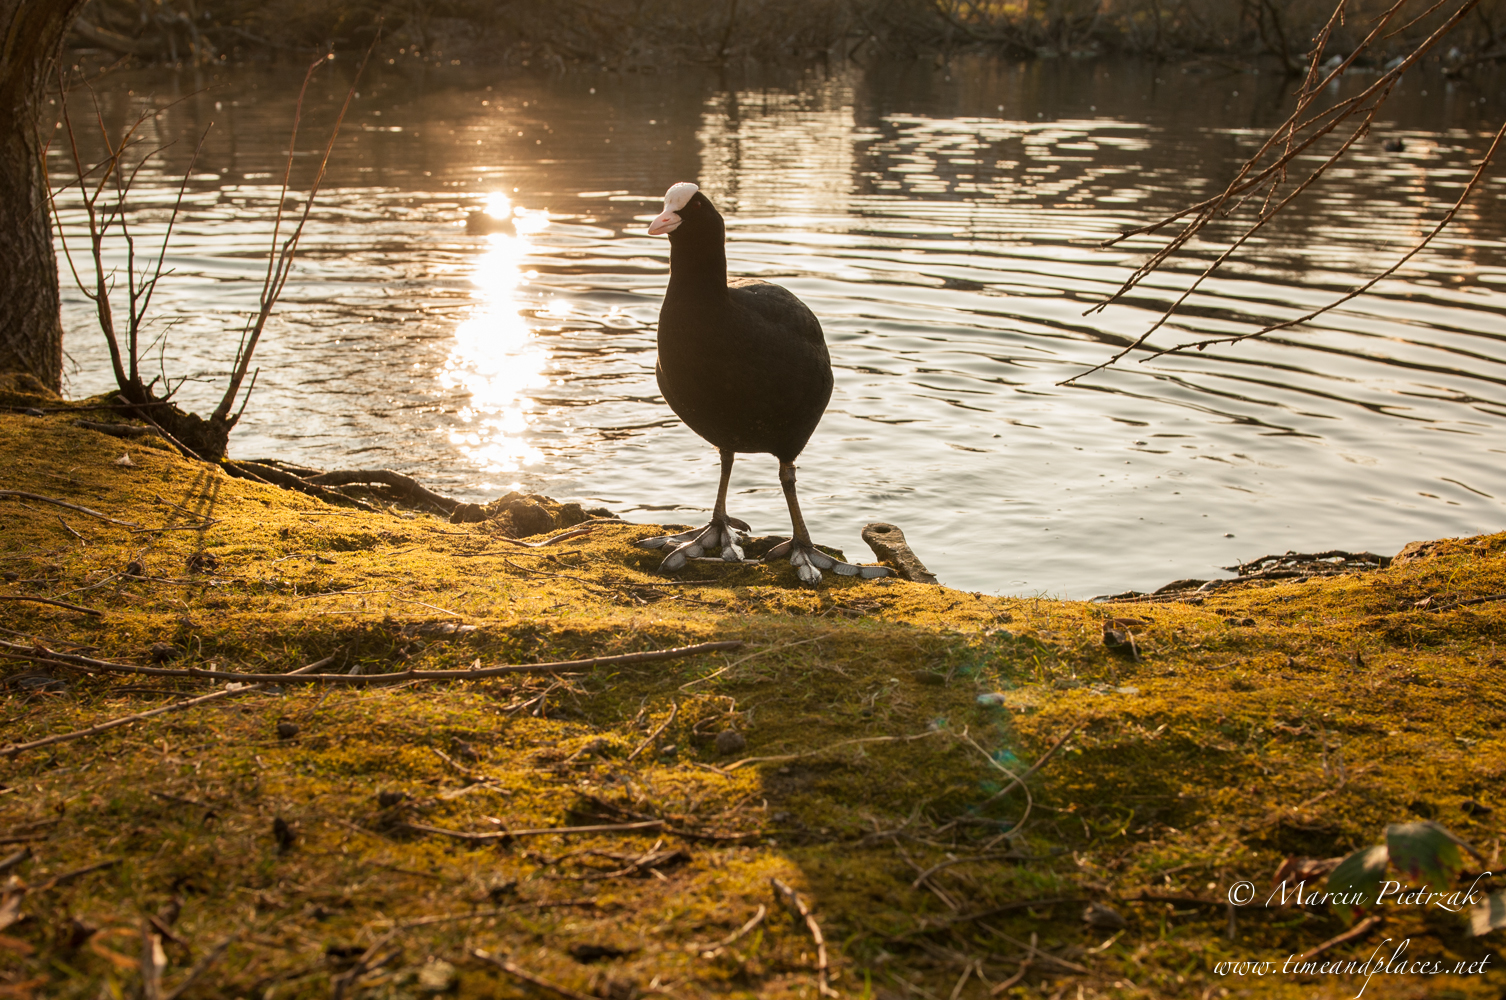 netPtaki Lochend Park - 2019 - MAR_4140.jpg